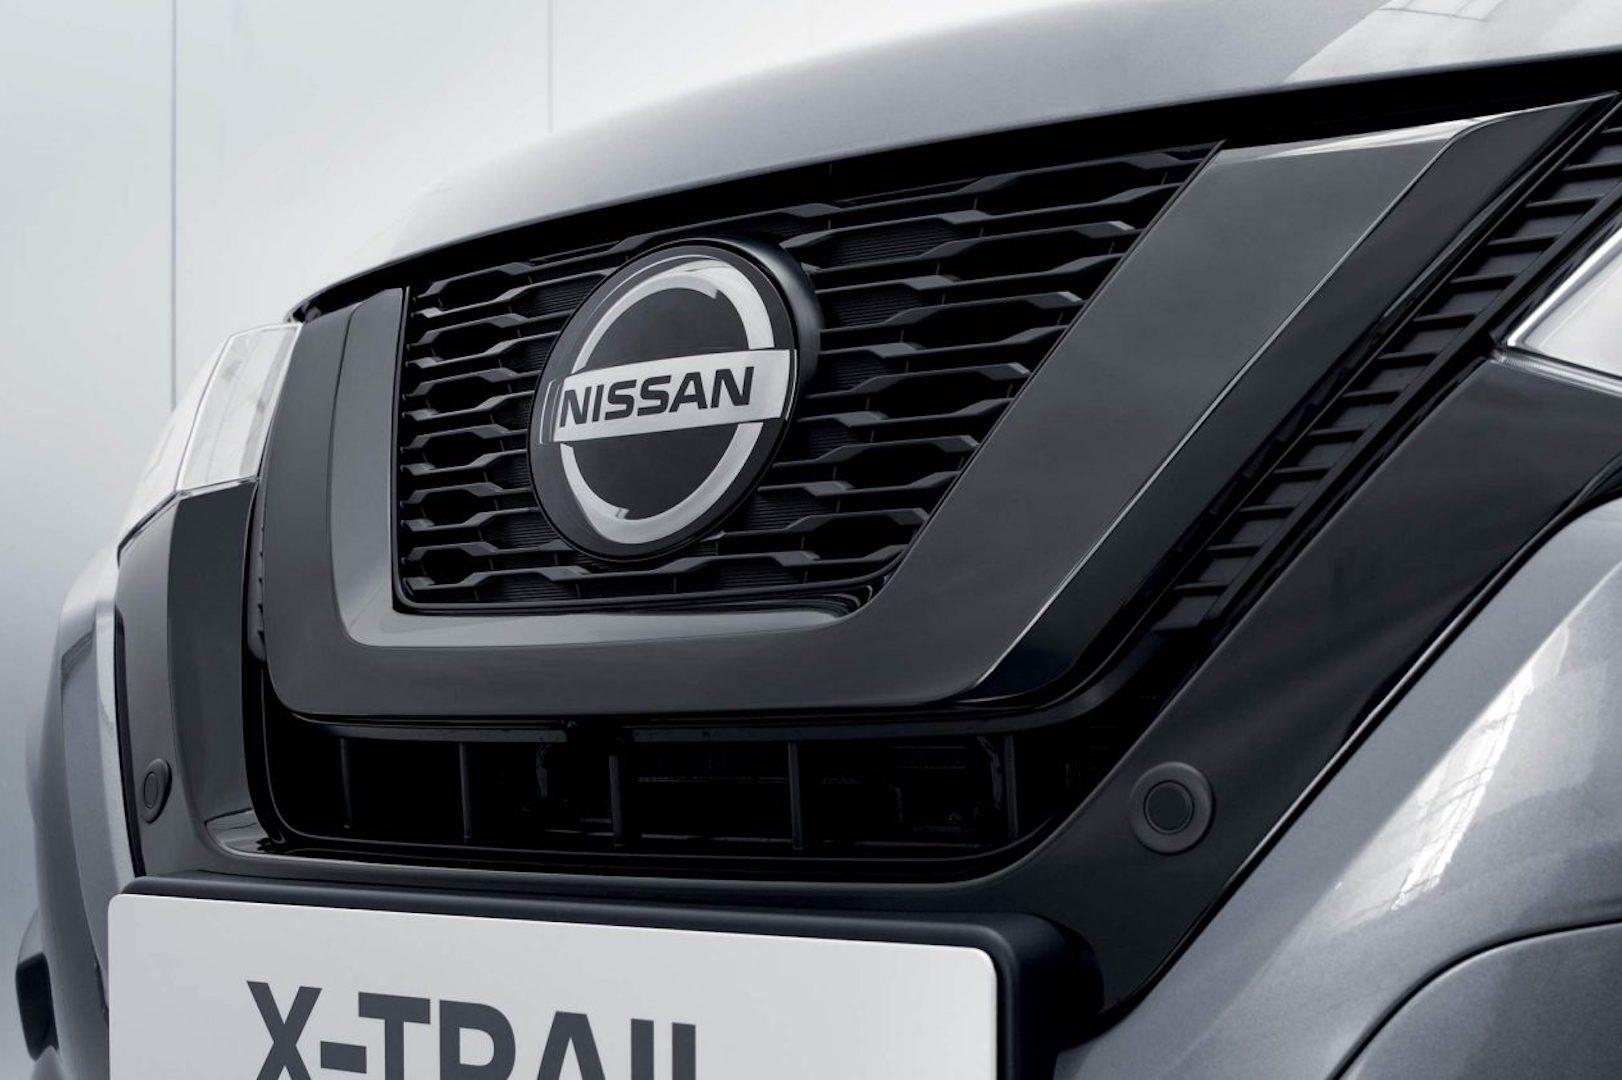 grelha do Nissan X-Trail